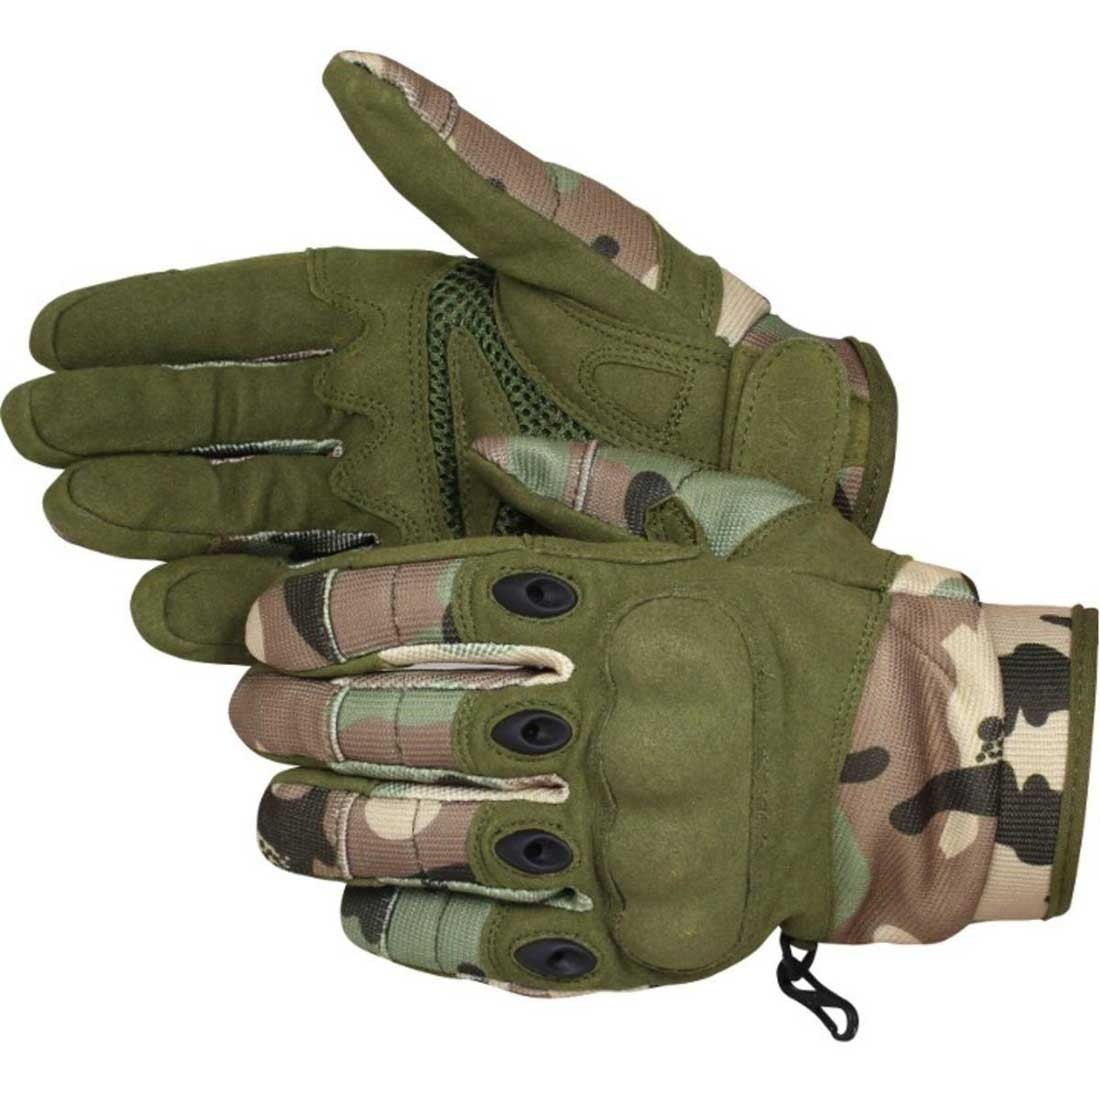 Viper Elite Gloves VCAM Multicam XL